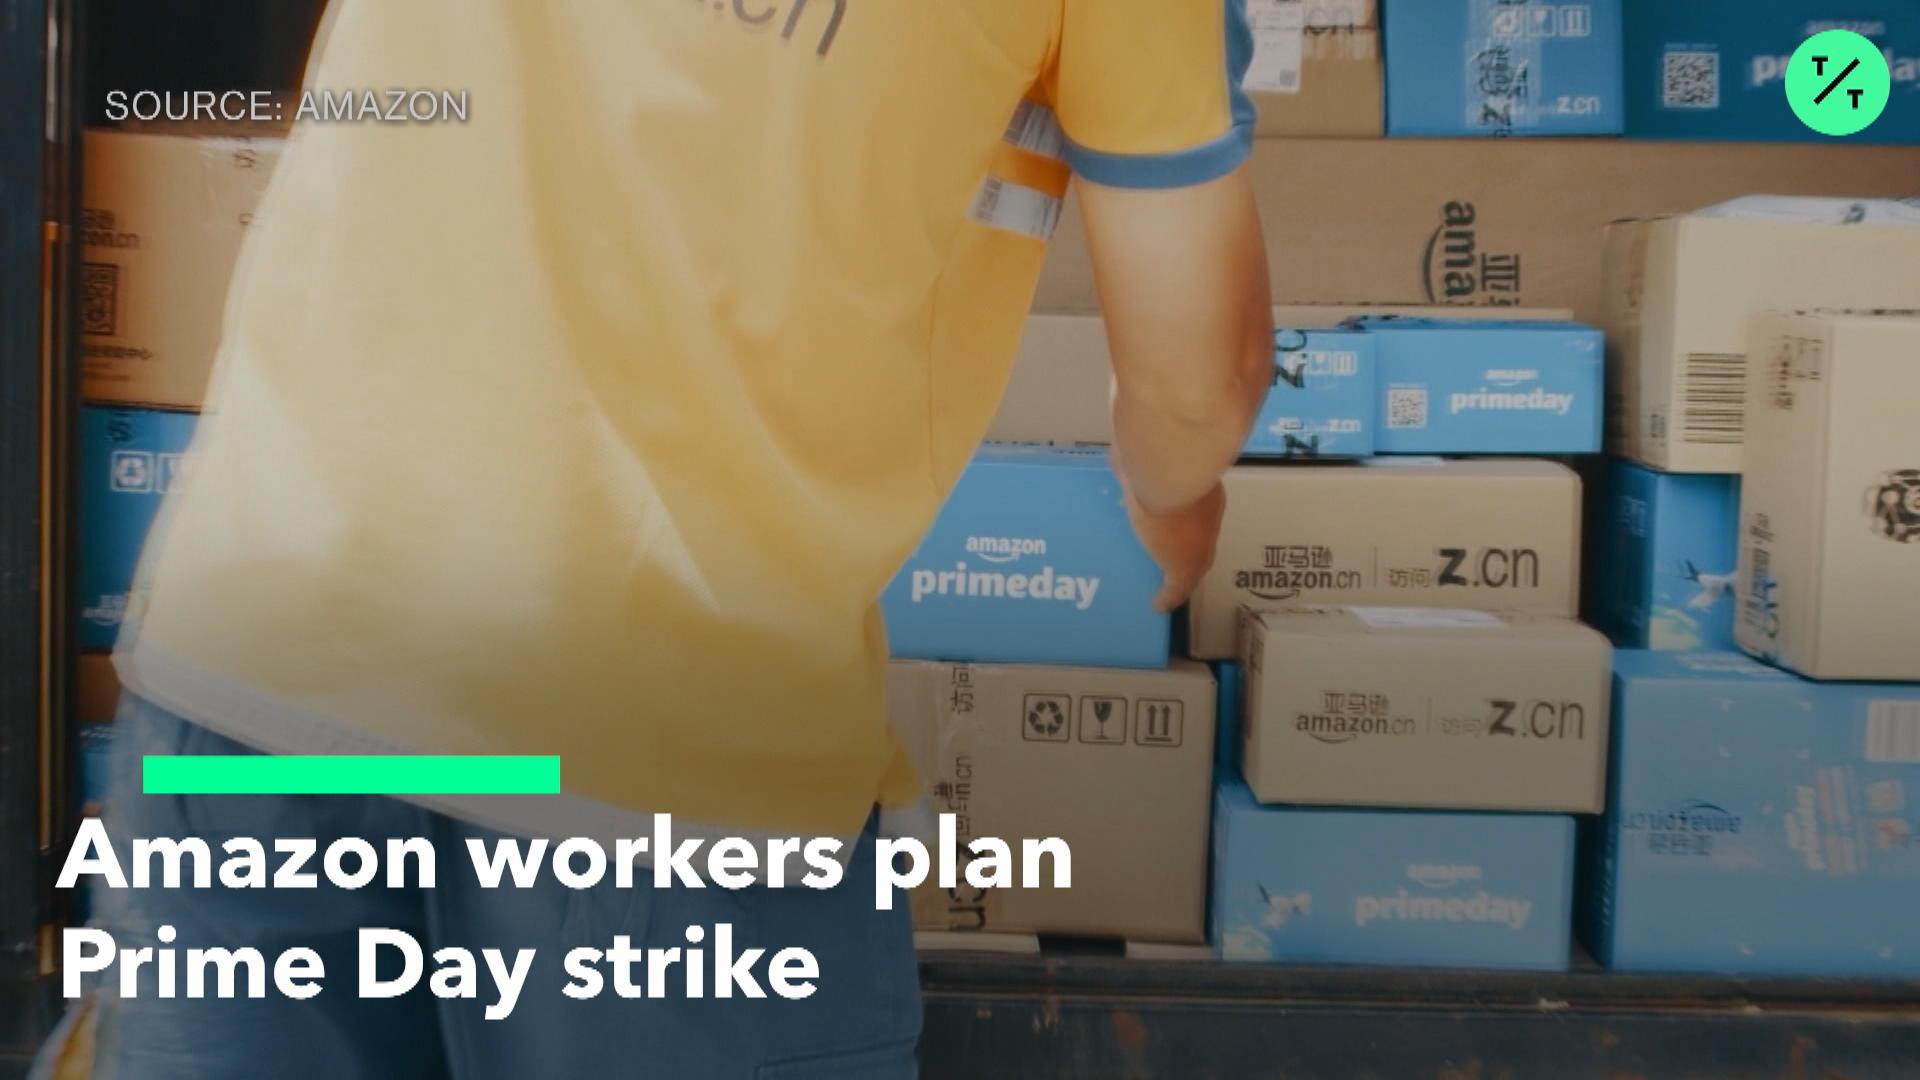 Amazon (AMZN) Workers Plan Prime Day Strike Despite Wage